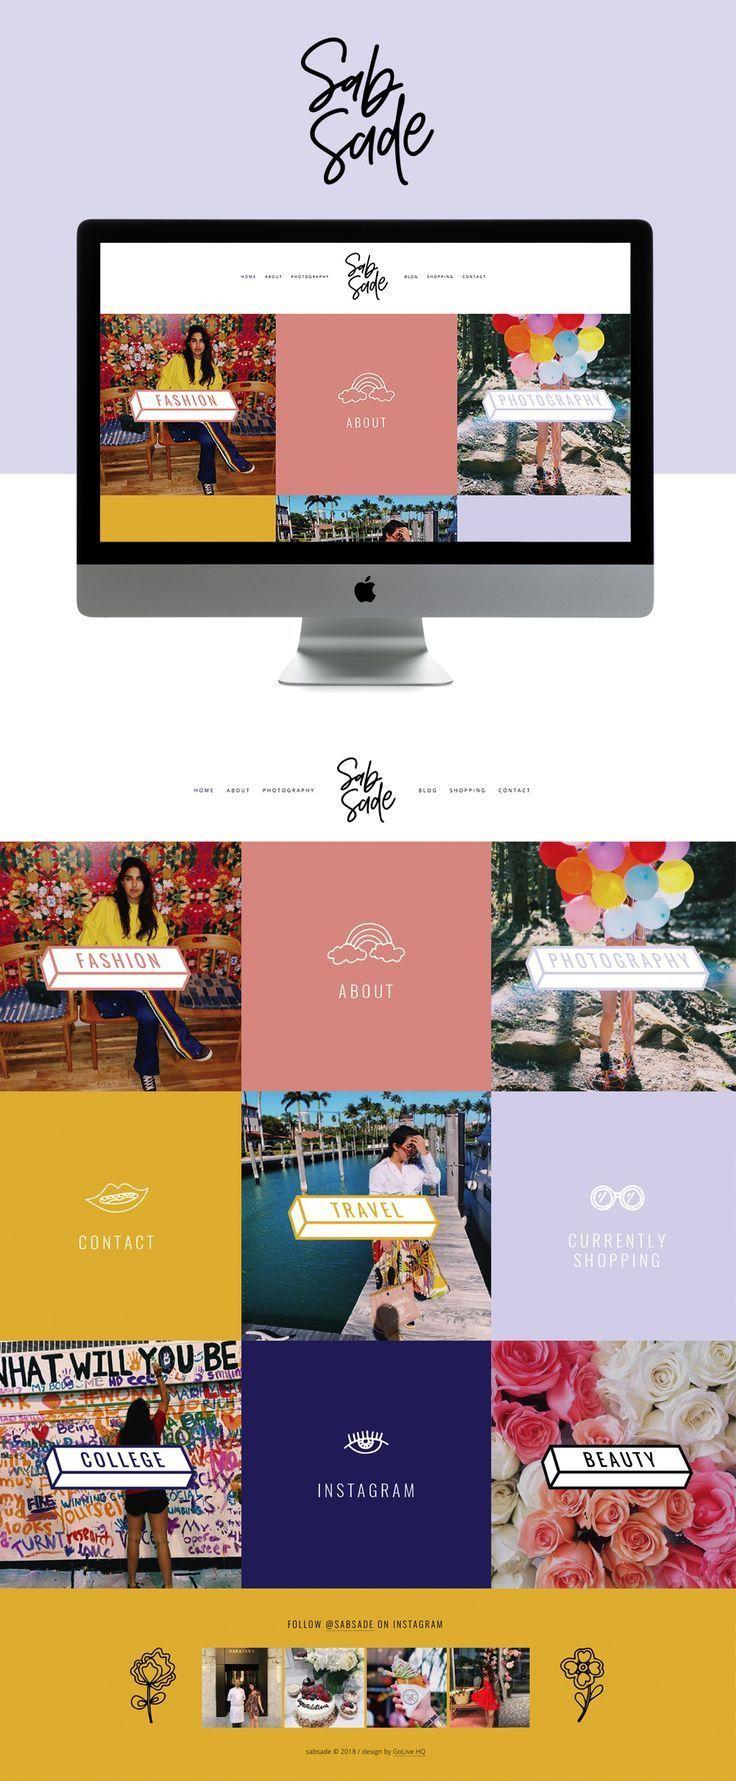 Sab Sade Is Live On Squarespace Website Designs Web Design Inspiration 2018 Bes Portfolio Website Design Website Layout Inspiration Website Design Layout